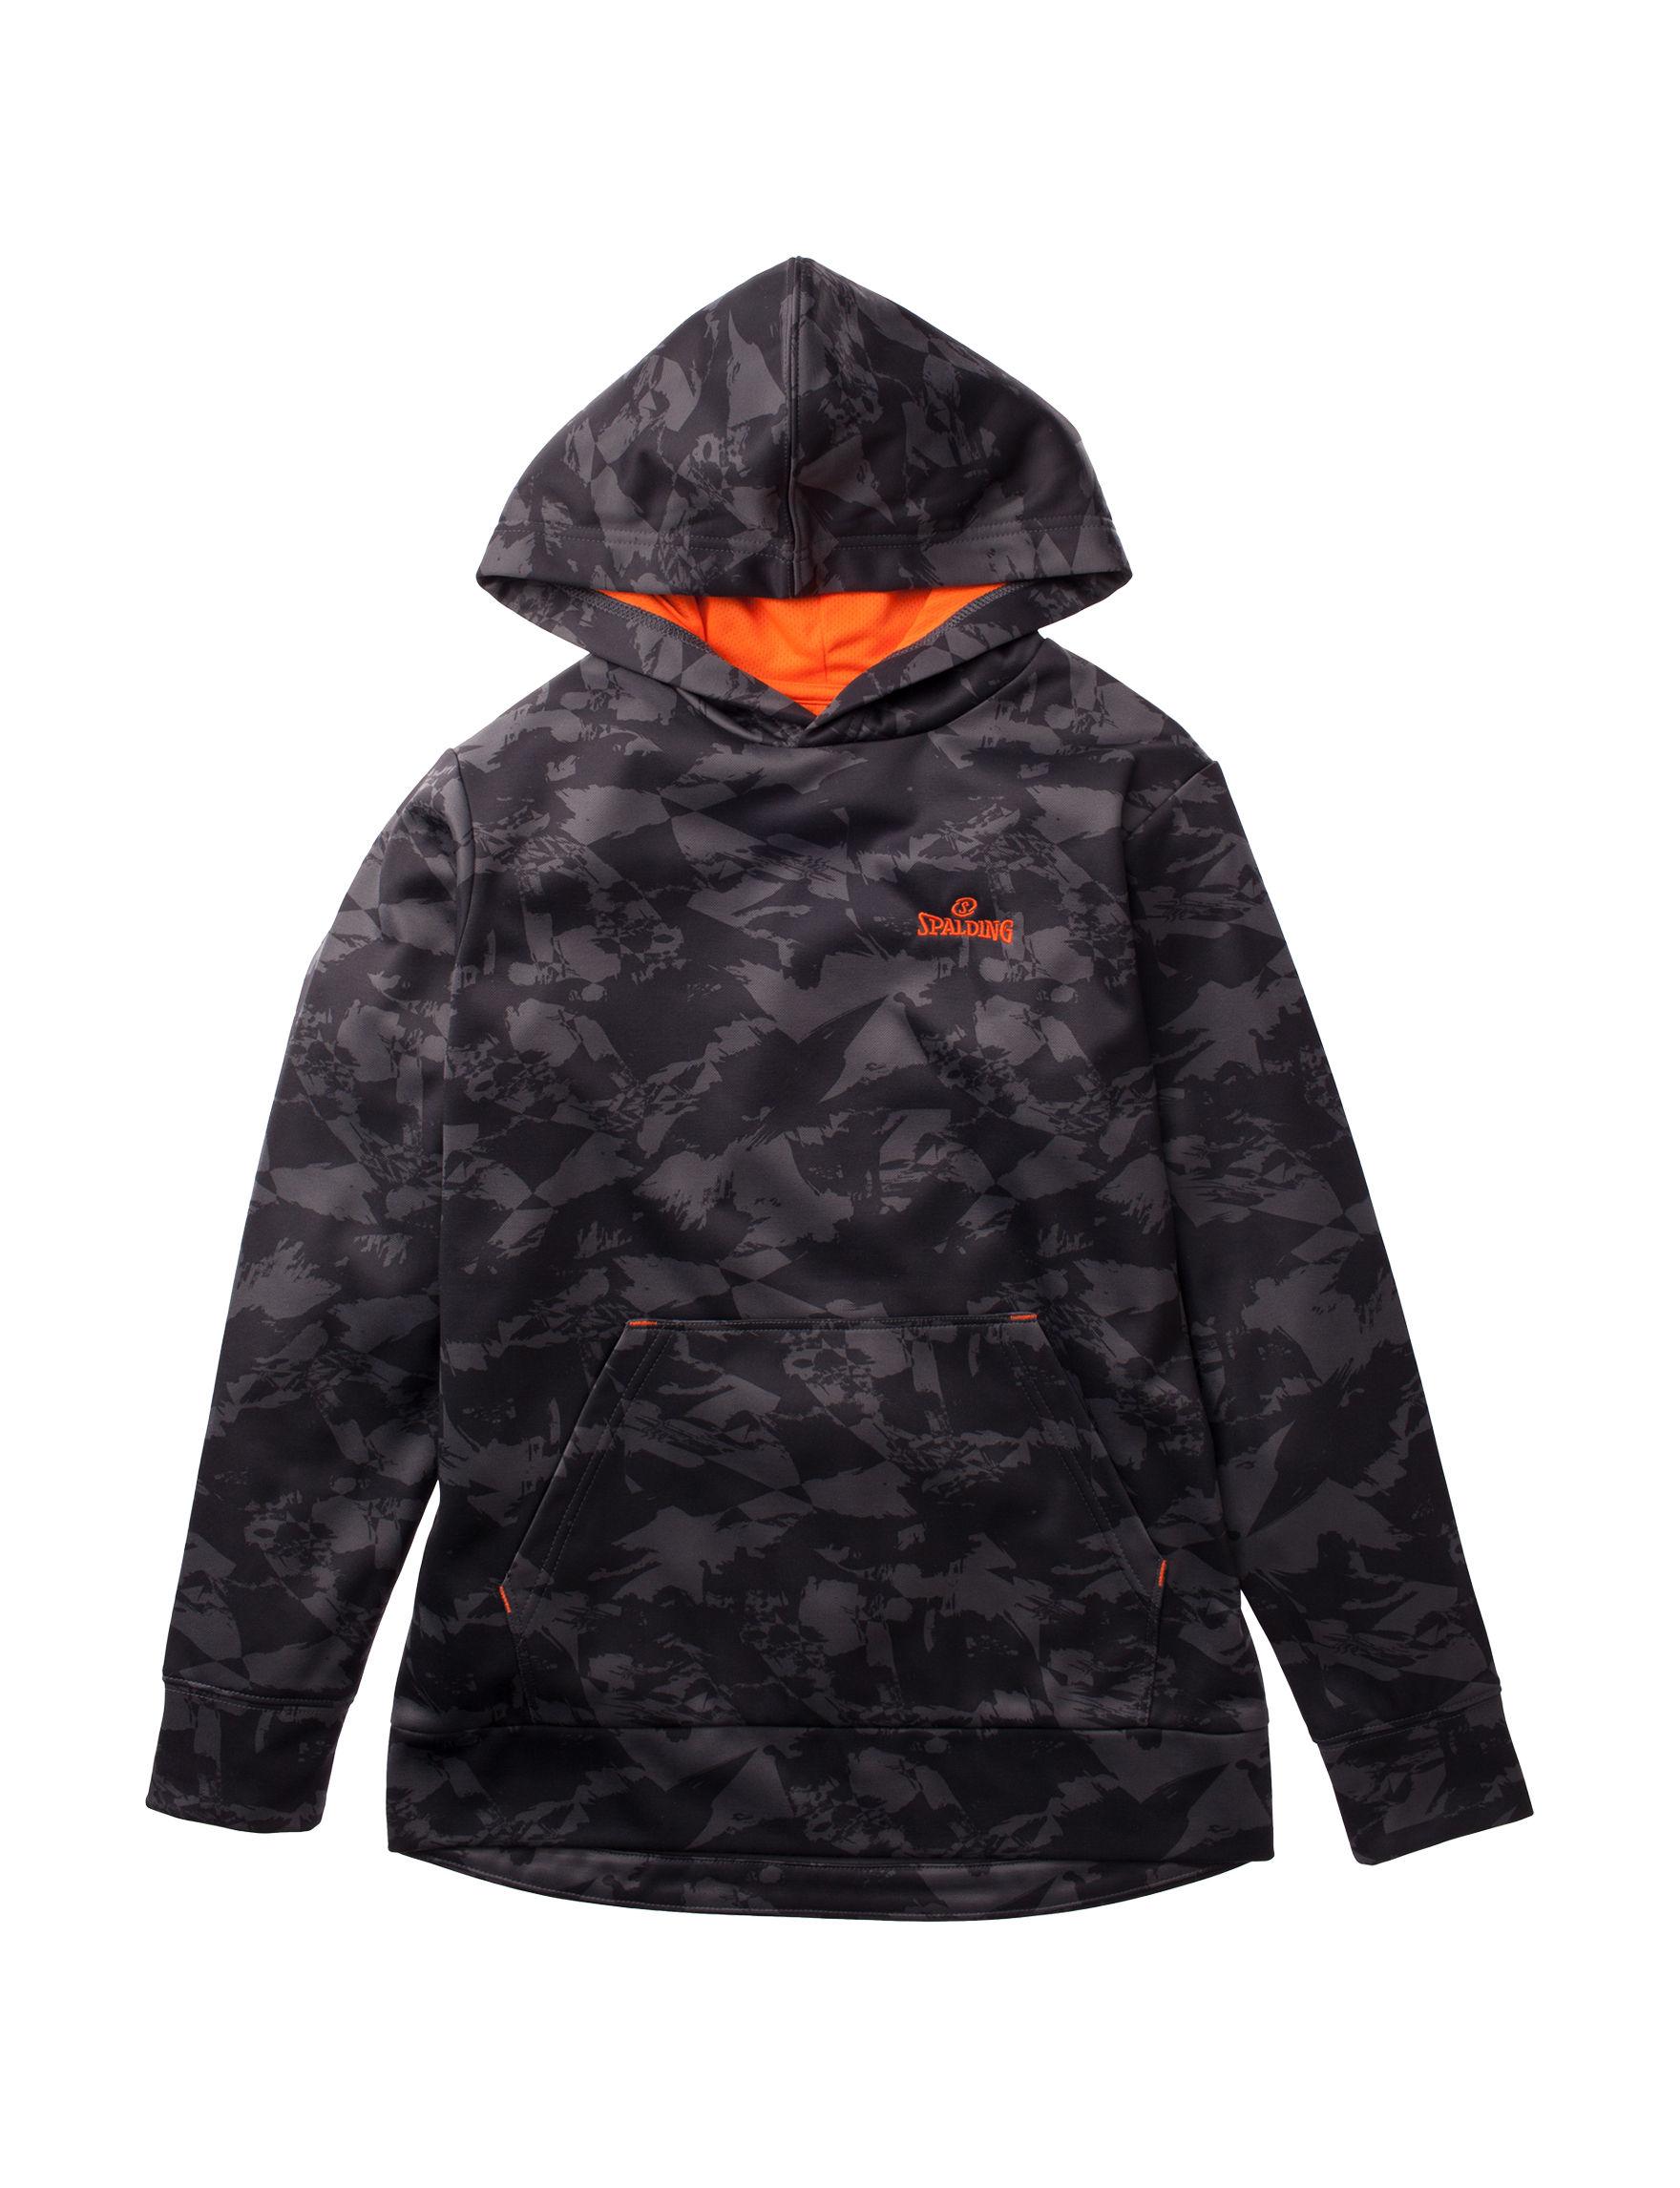 Spalding Grey / Orange